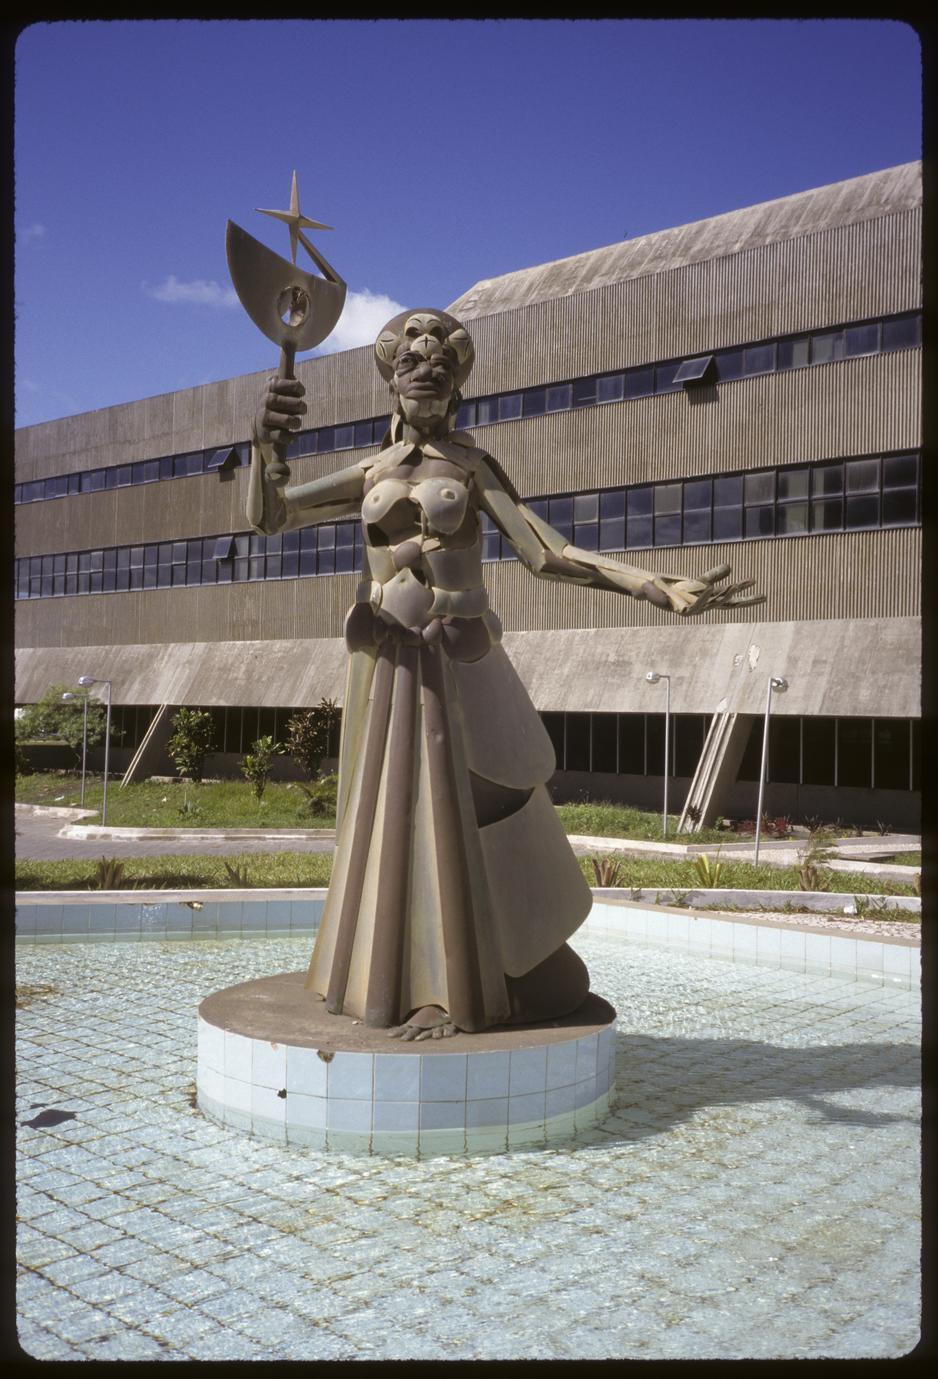 Orixa (Orisa / Orisha) Sculpture by Mario Cravo (1 of 2)